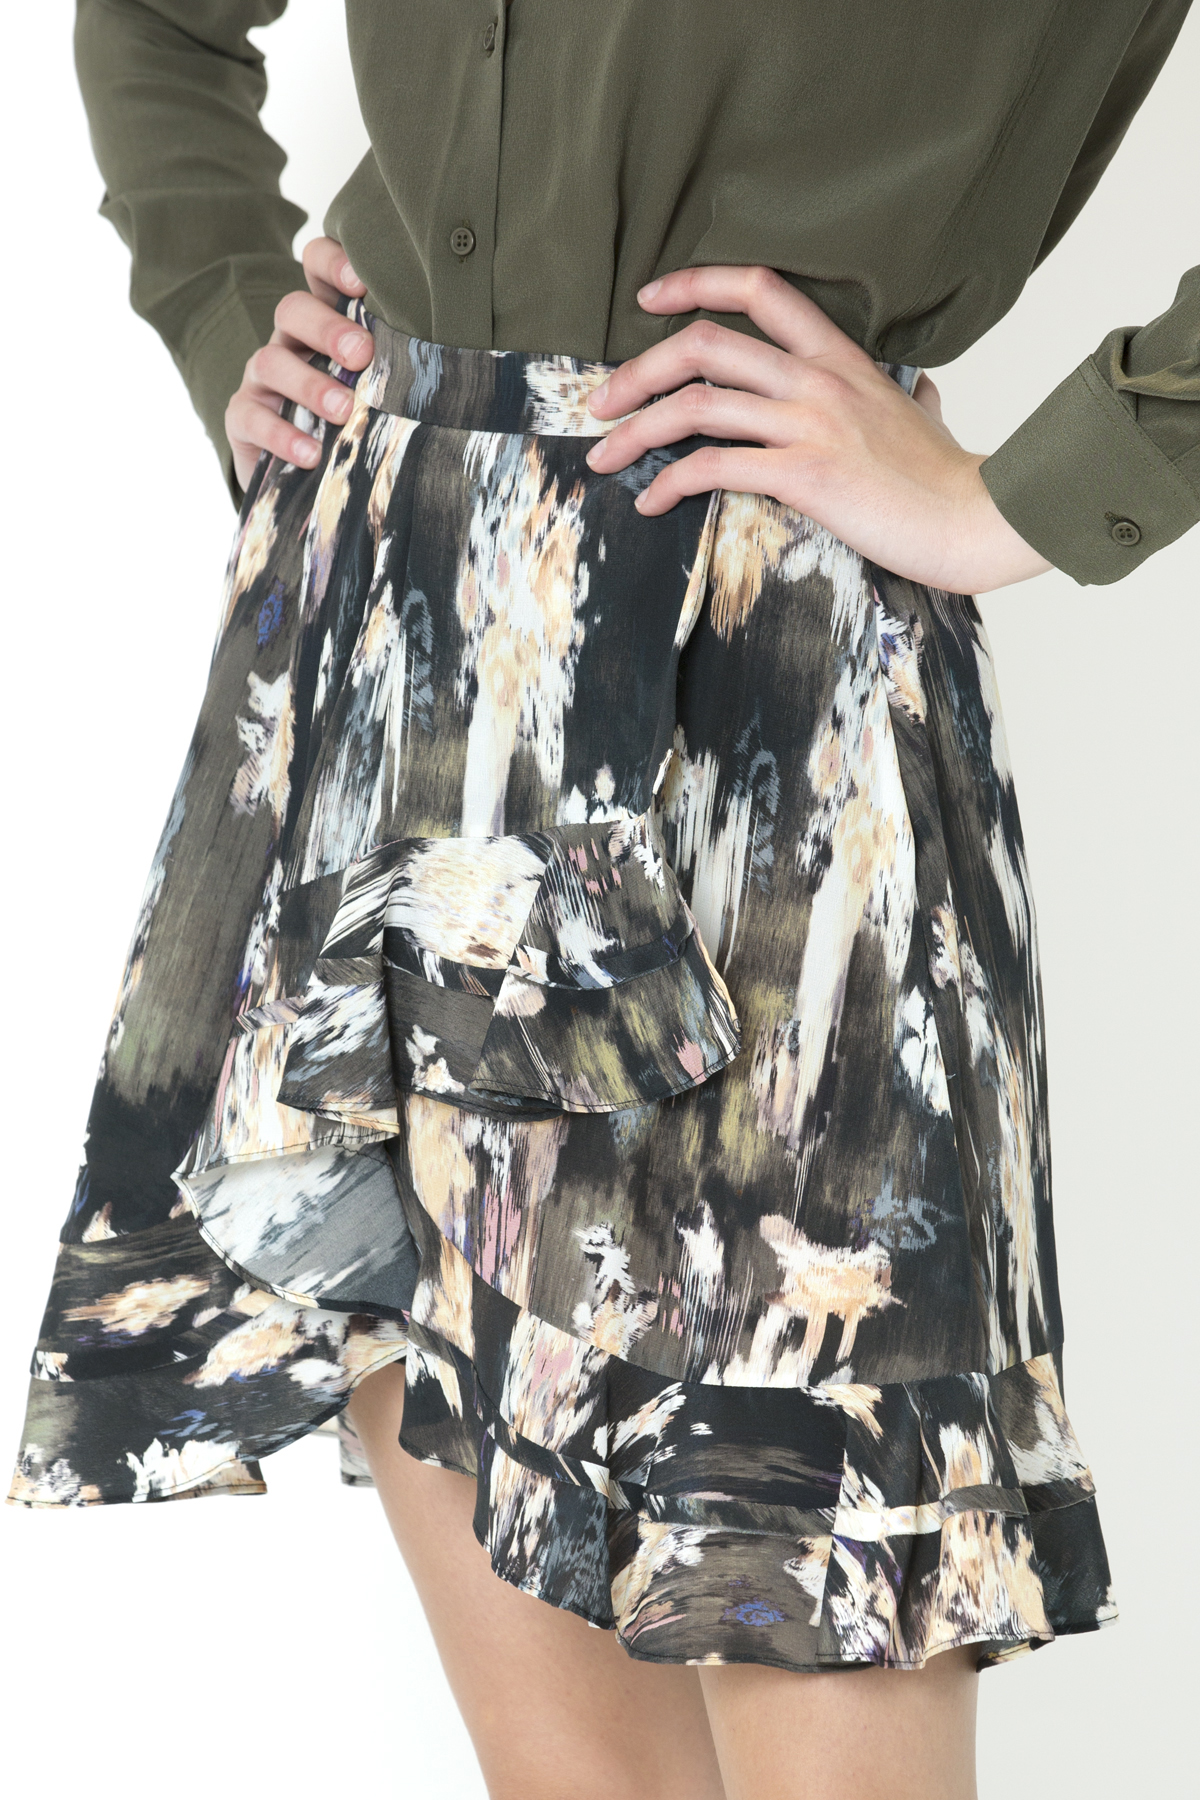 clemire-skirt-black-silk-iro-matchboxathens